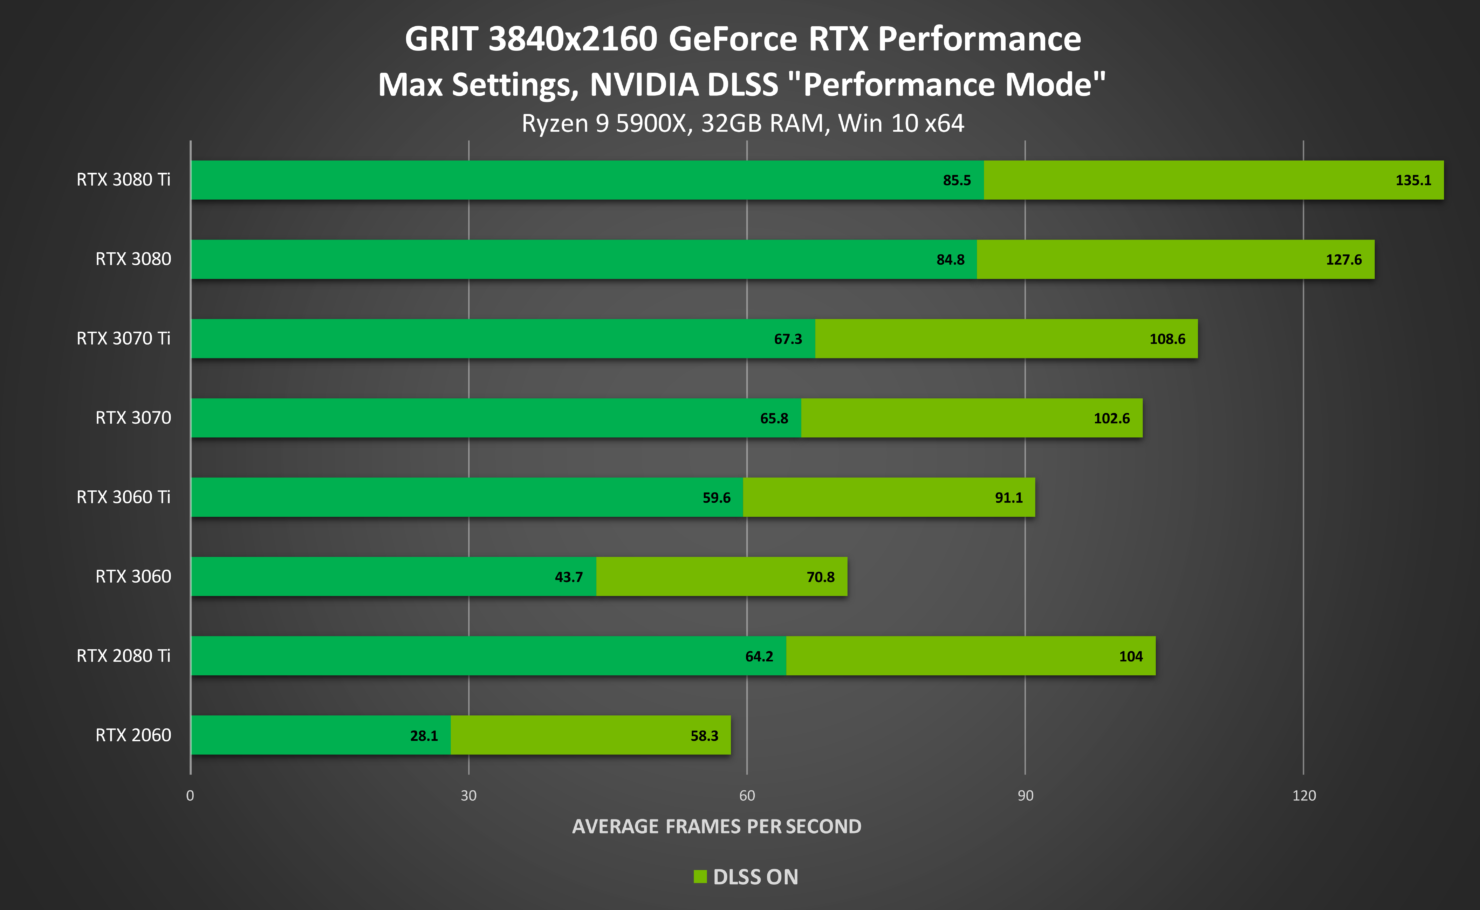 grit-geforce-rtx-3840x2160-ray-tracing-on-nvidia-dlss-desktop-gpu-performance